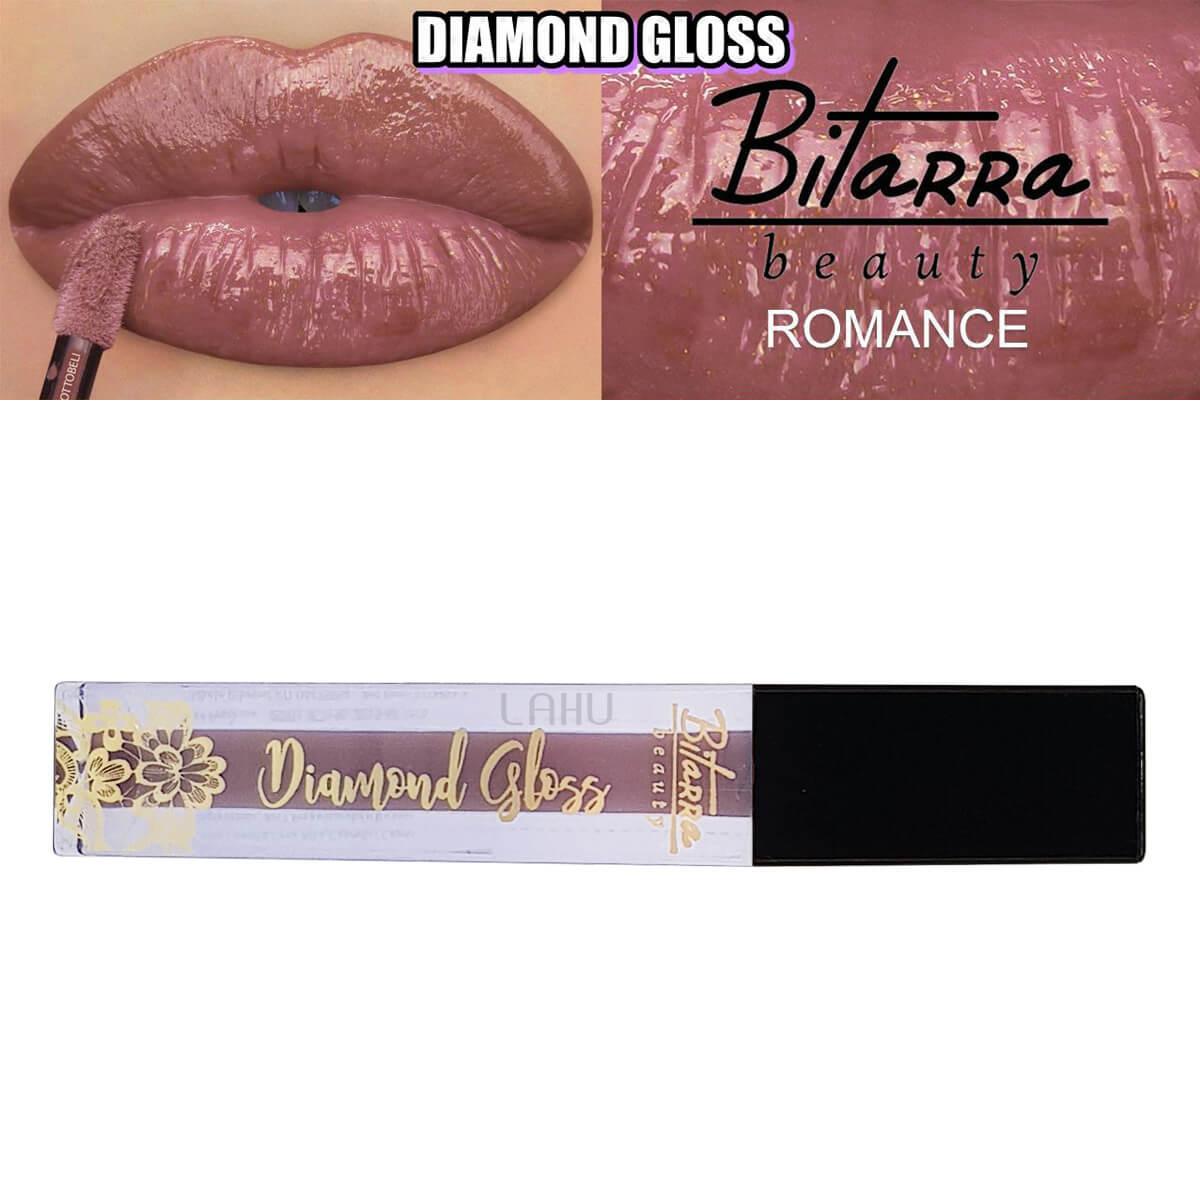 Gloss Diamond Romance Bitarra